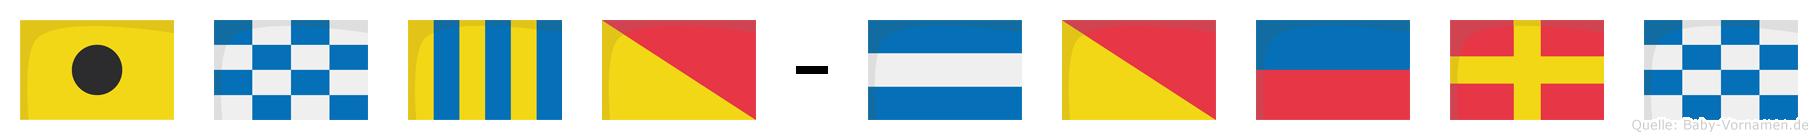 Ingo-Jörn im Flaggenalphabet